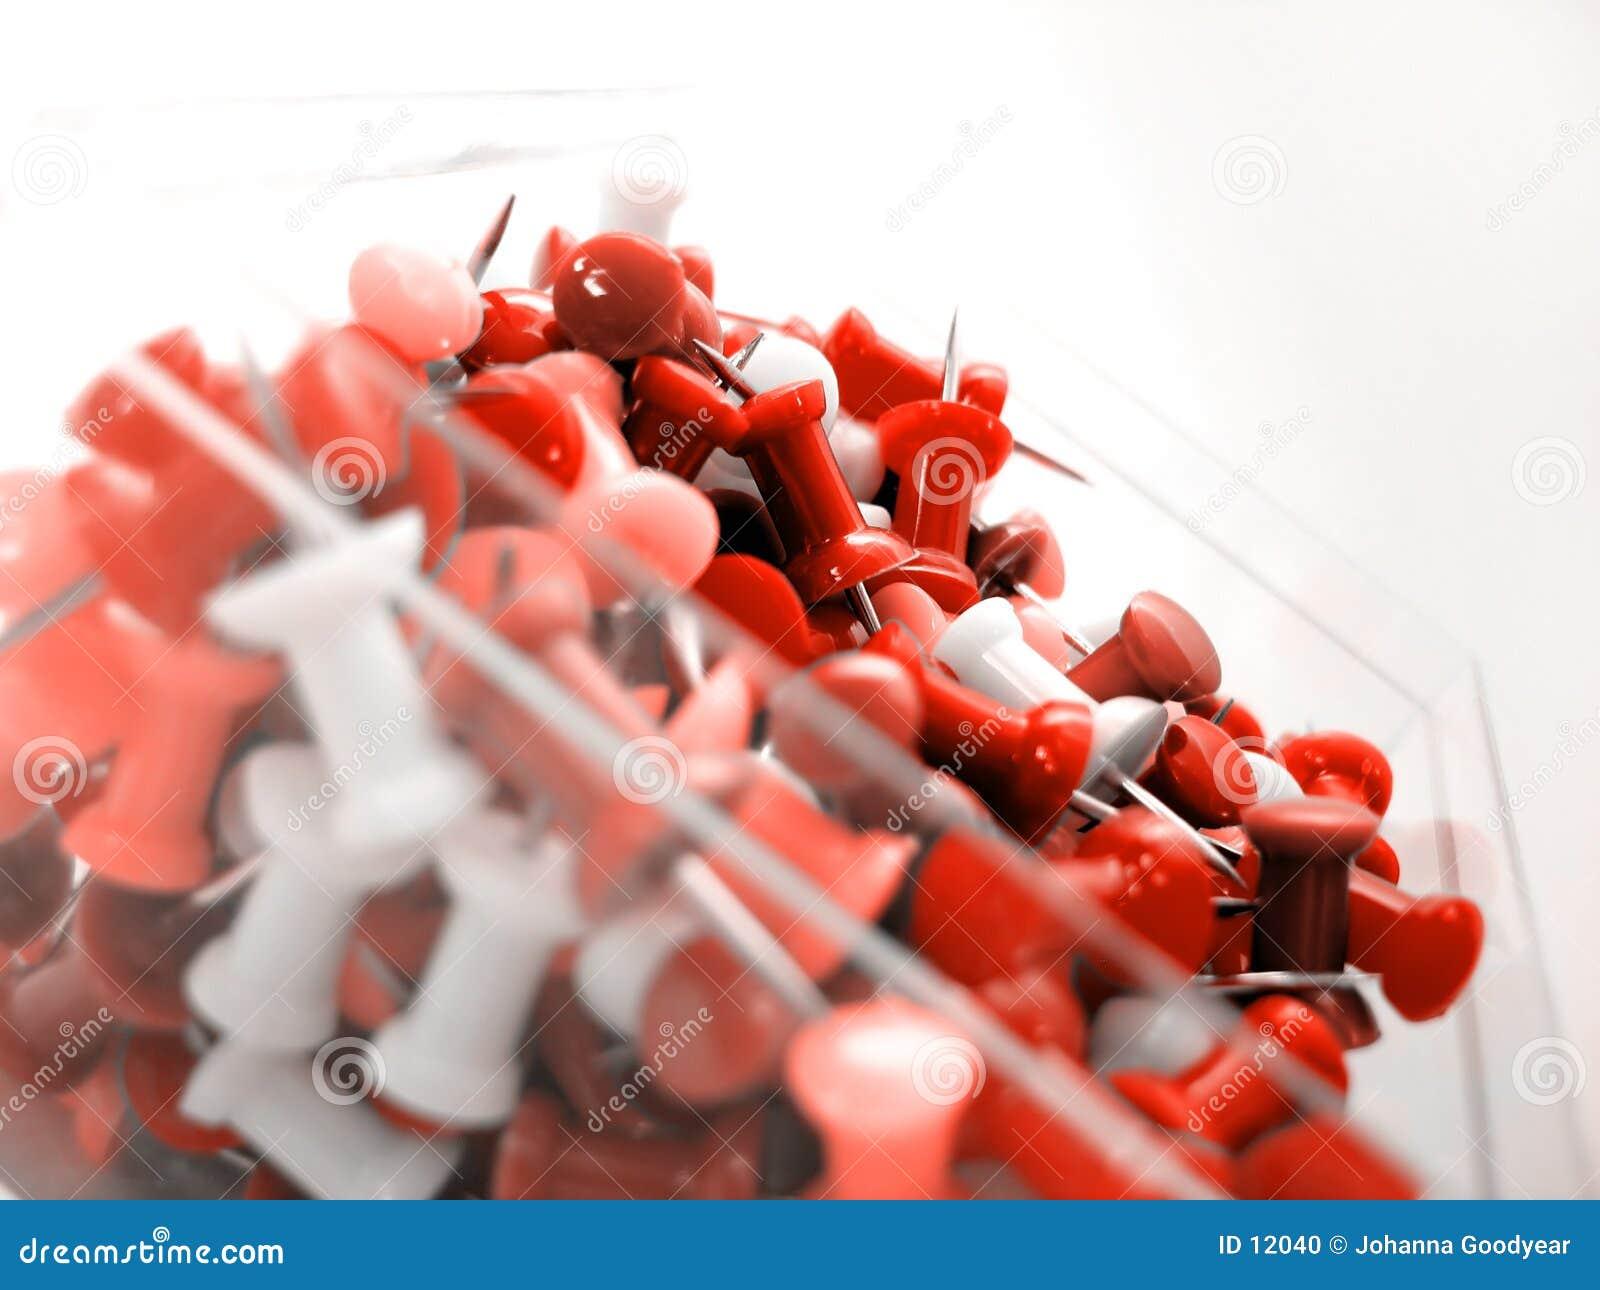 Red Tacks